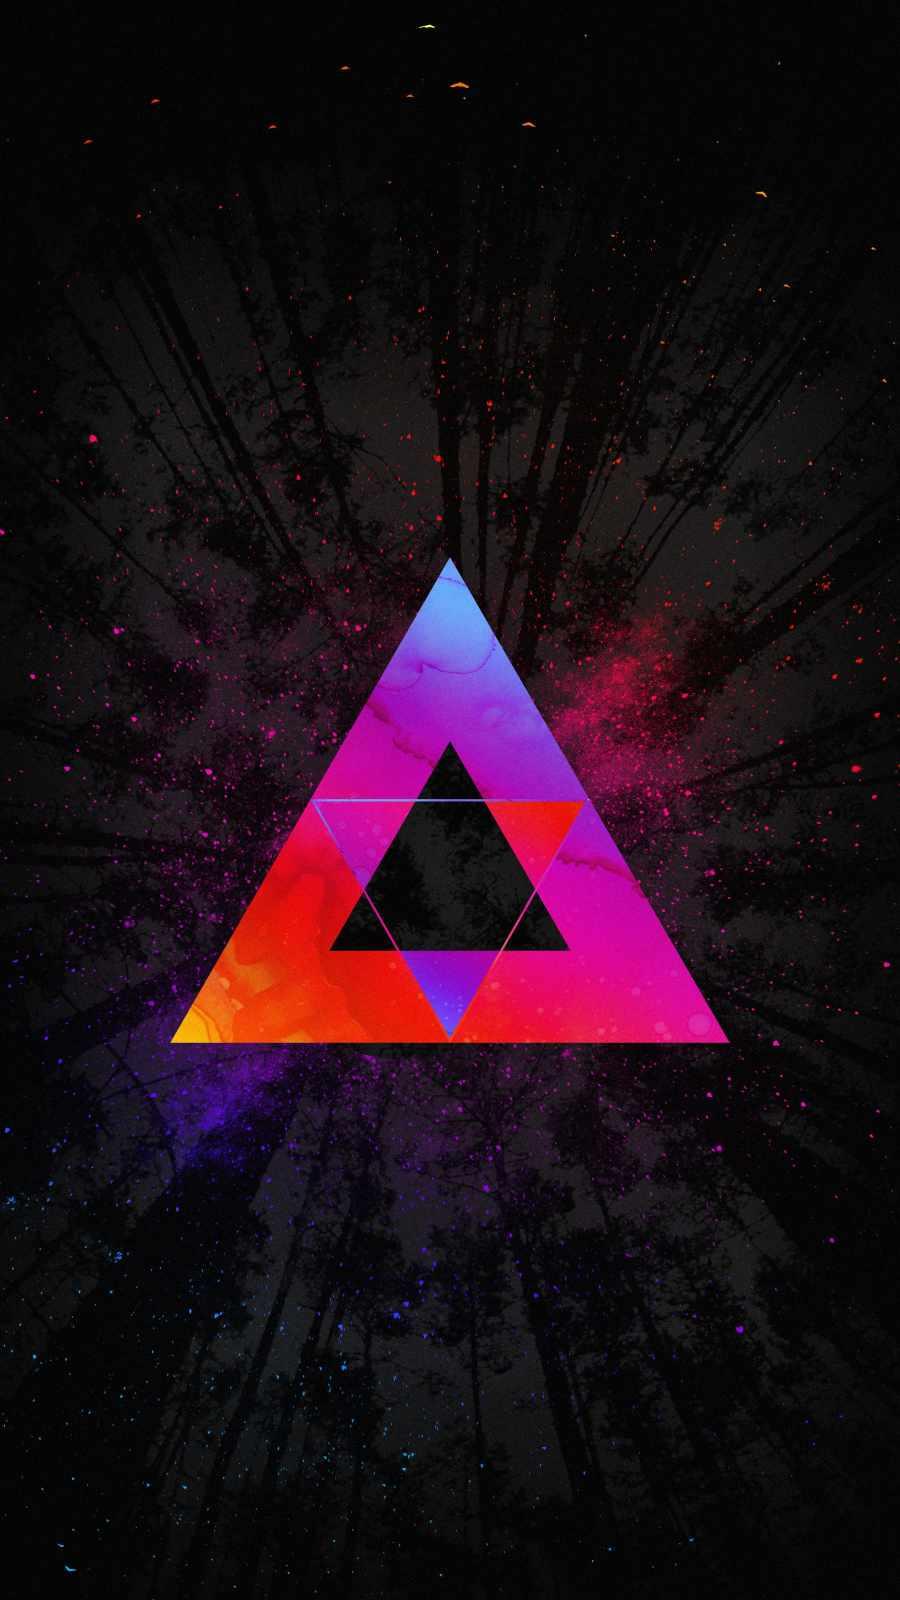 Triangle Art iPhone Wallpaper